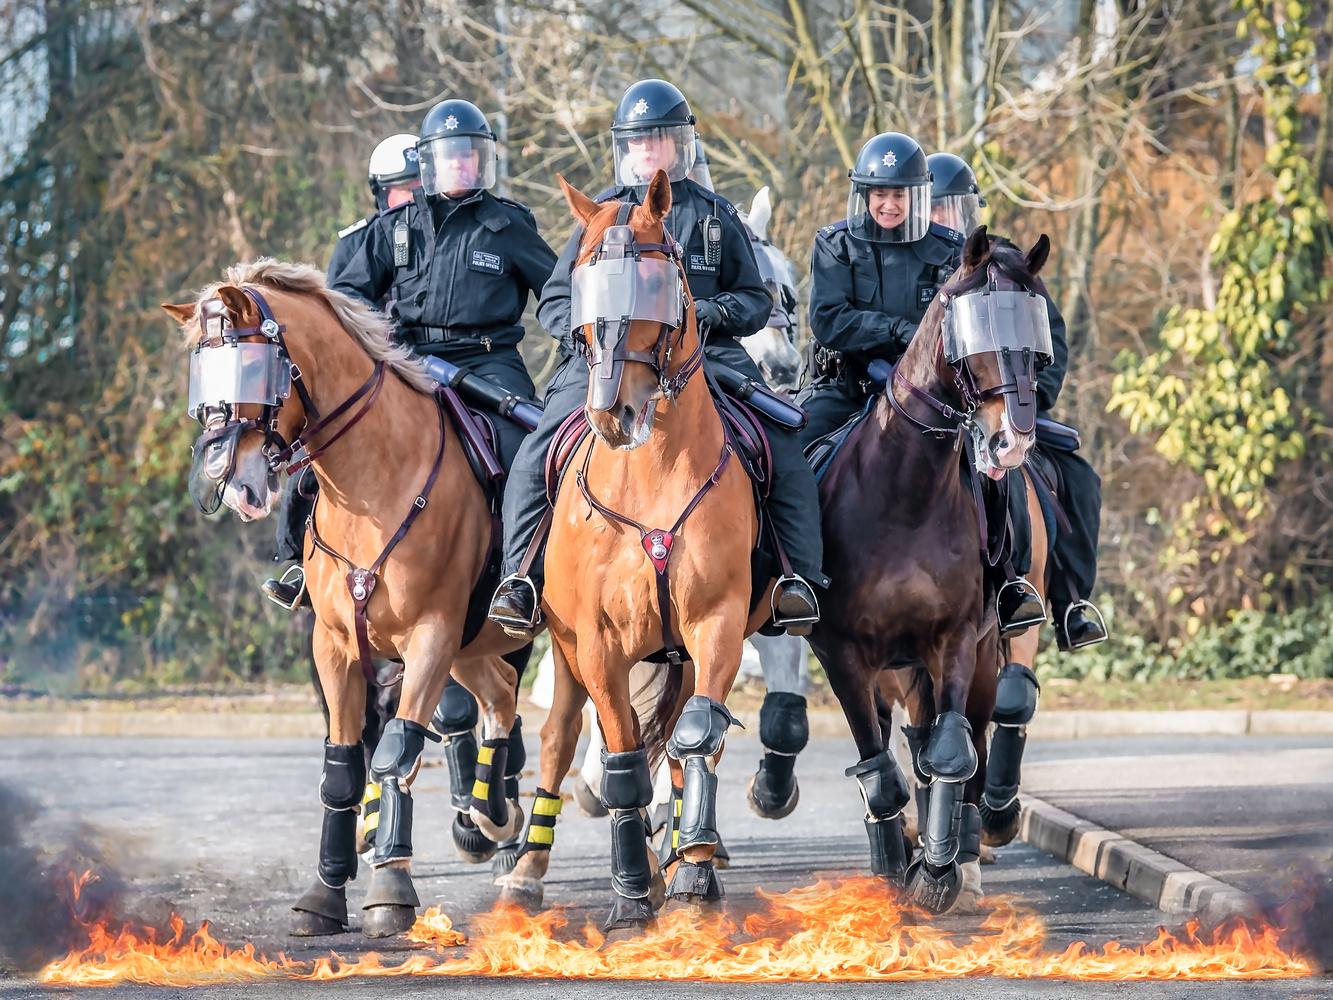 Police Horse & Rider Training by Richard Prestidge